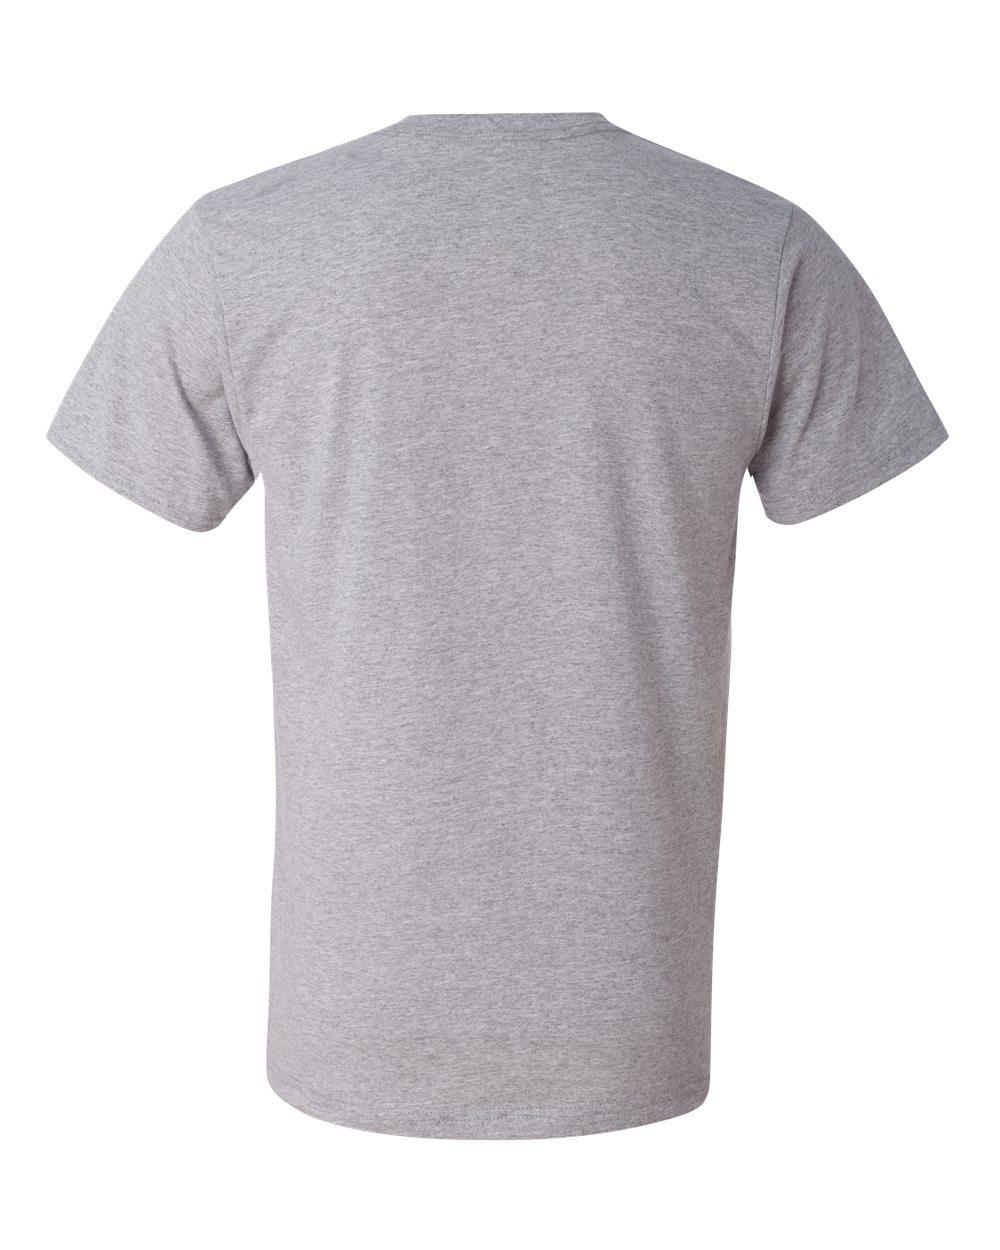 Anvil-Men-039-s-Lightweight-V-Neck-T-Shirt-982-S-3XL thumbnail 16